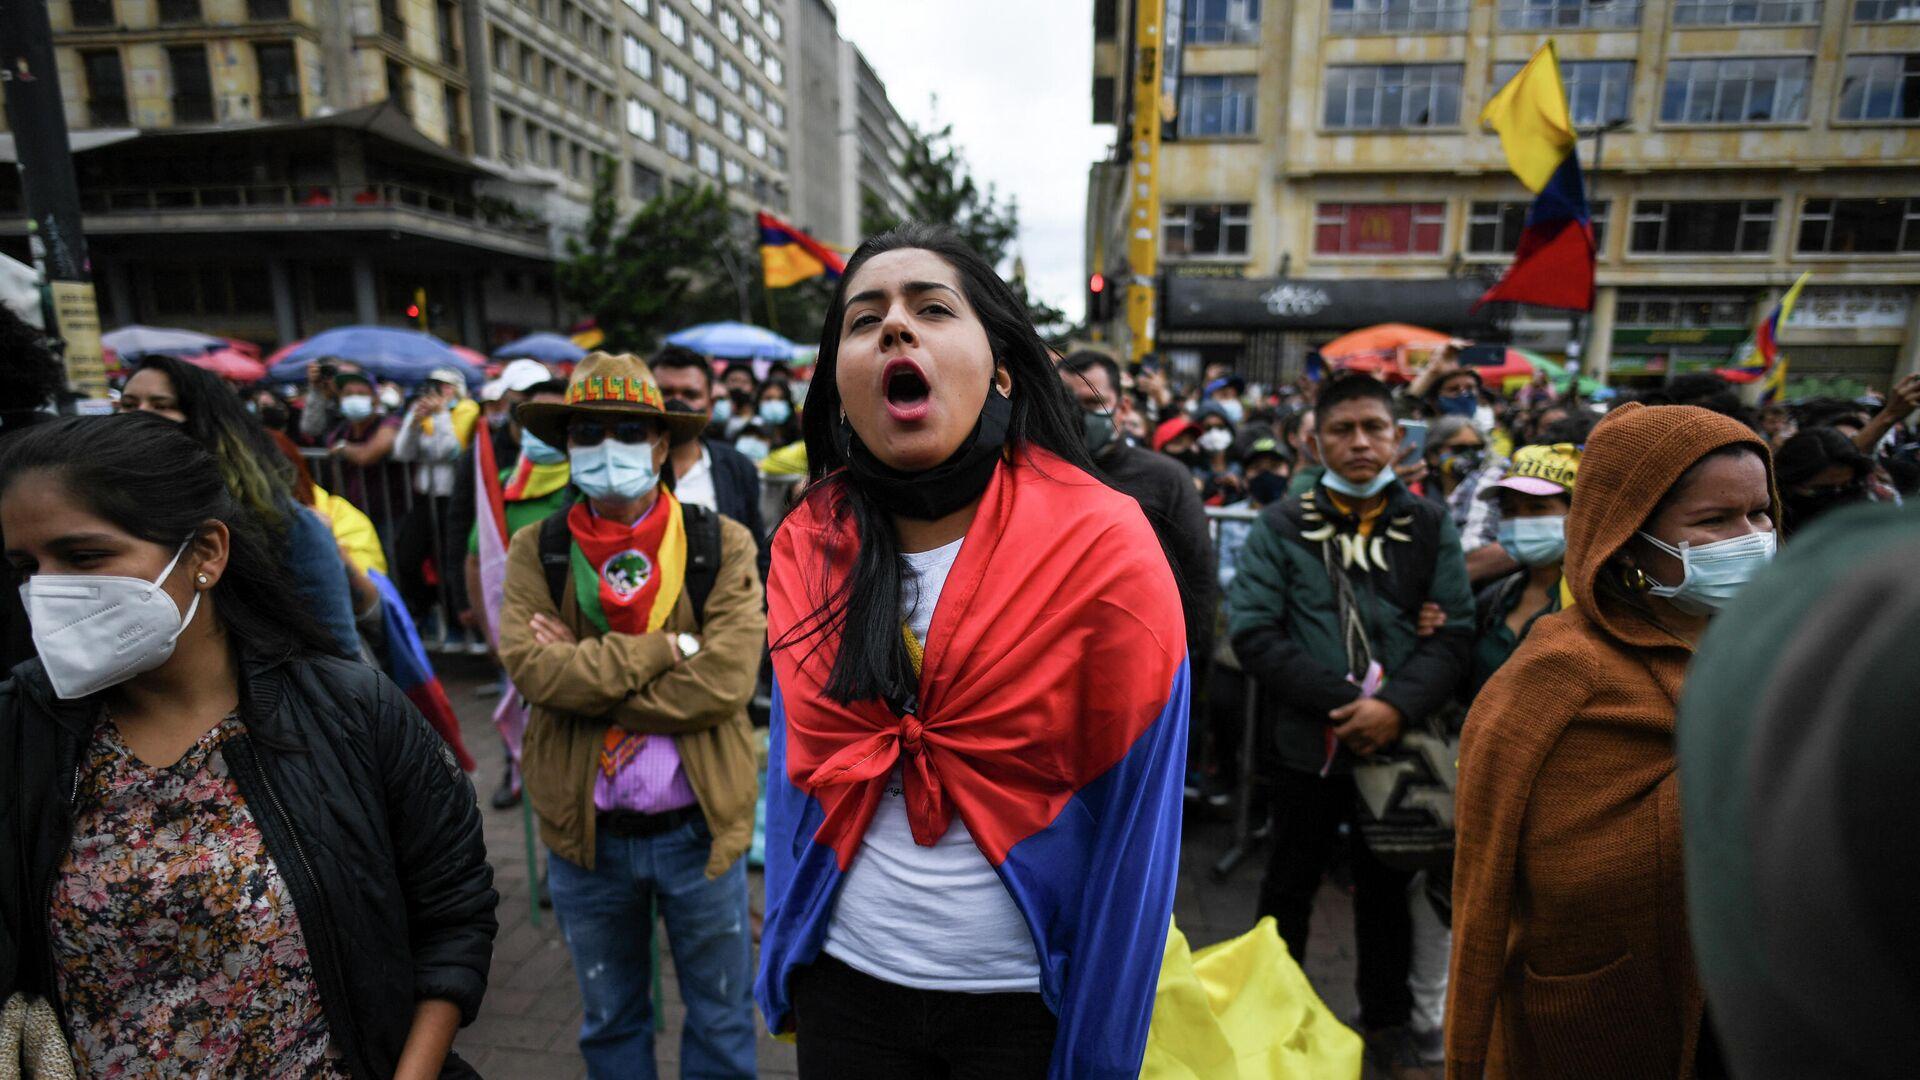 Protestas en Bogotá, Colombia (archivo) - Sputnik Mundo, 1920, 26.08.2021